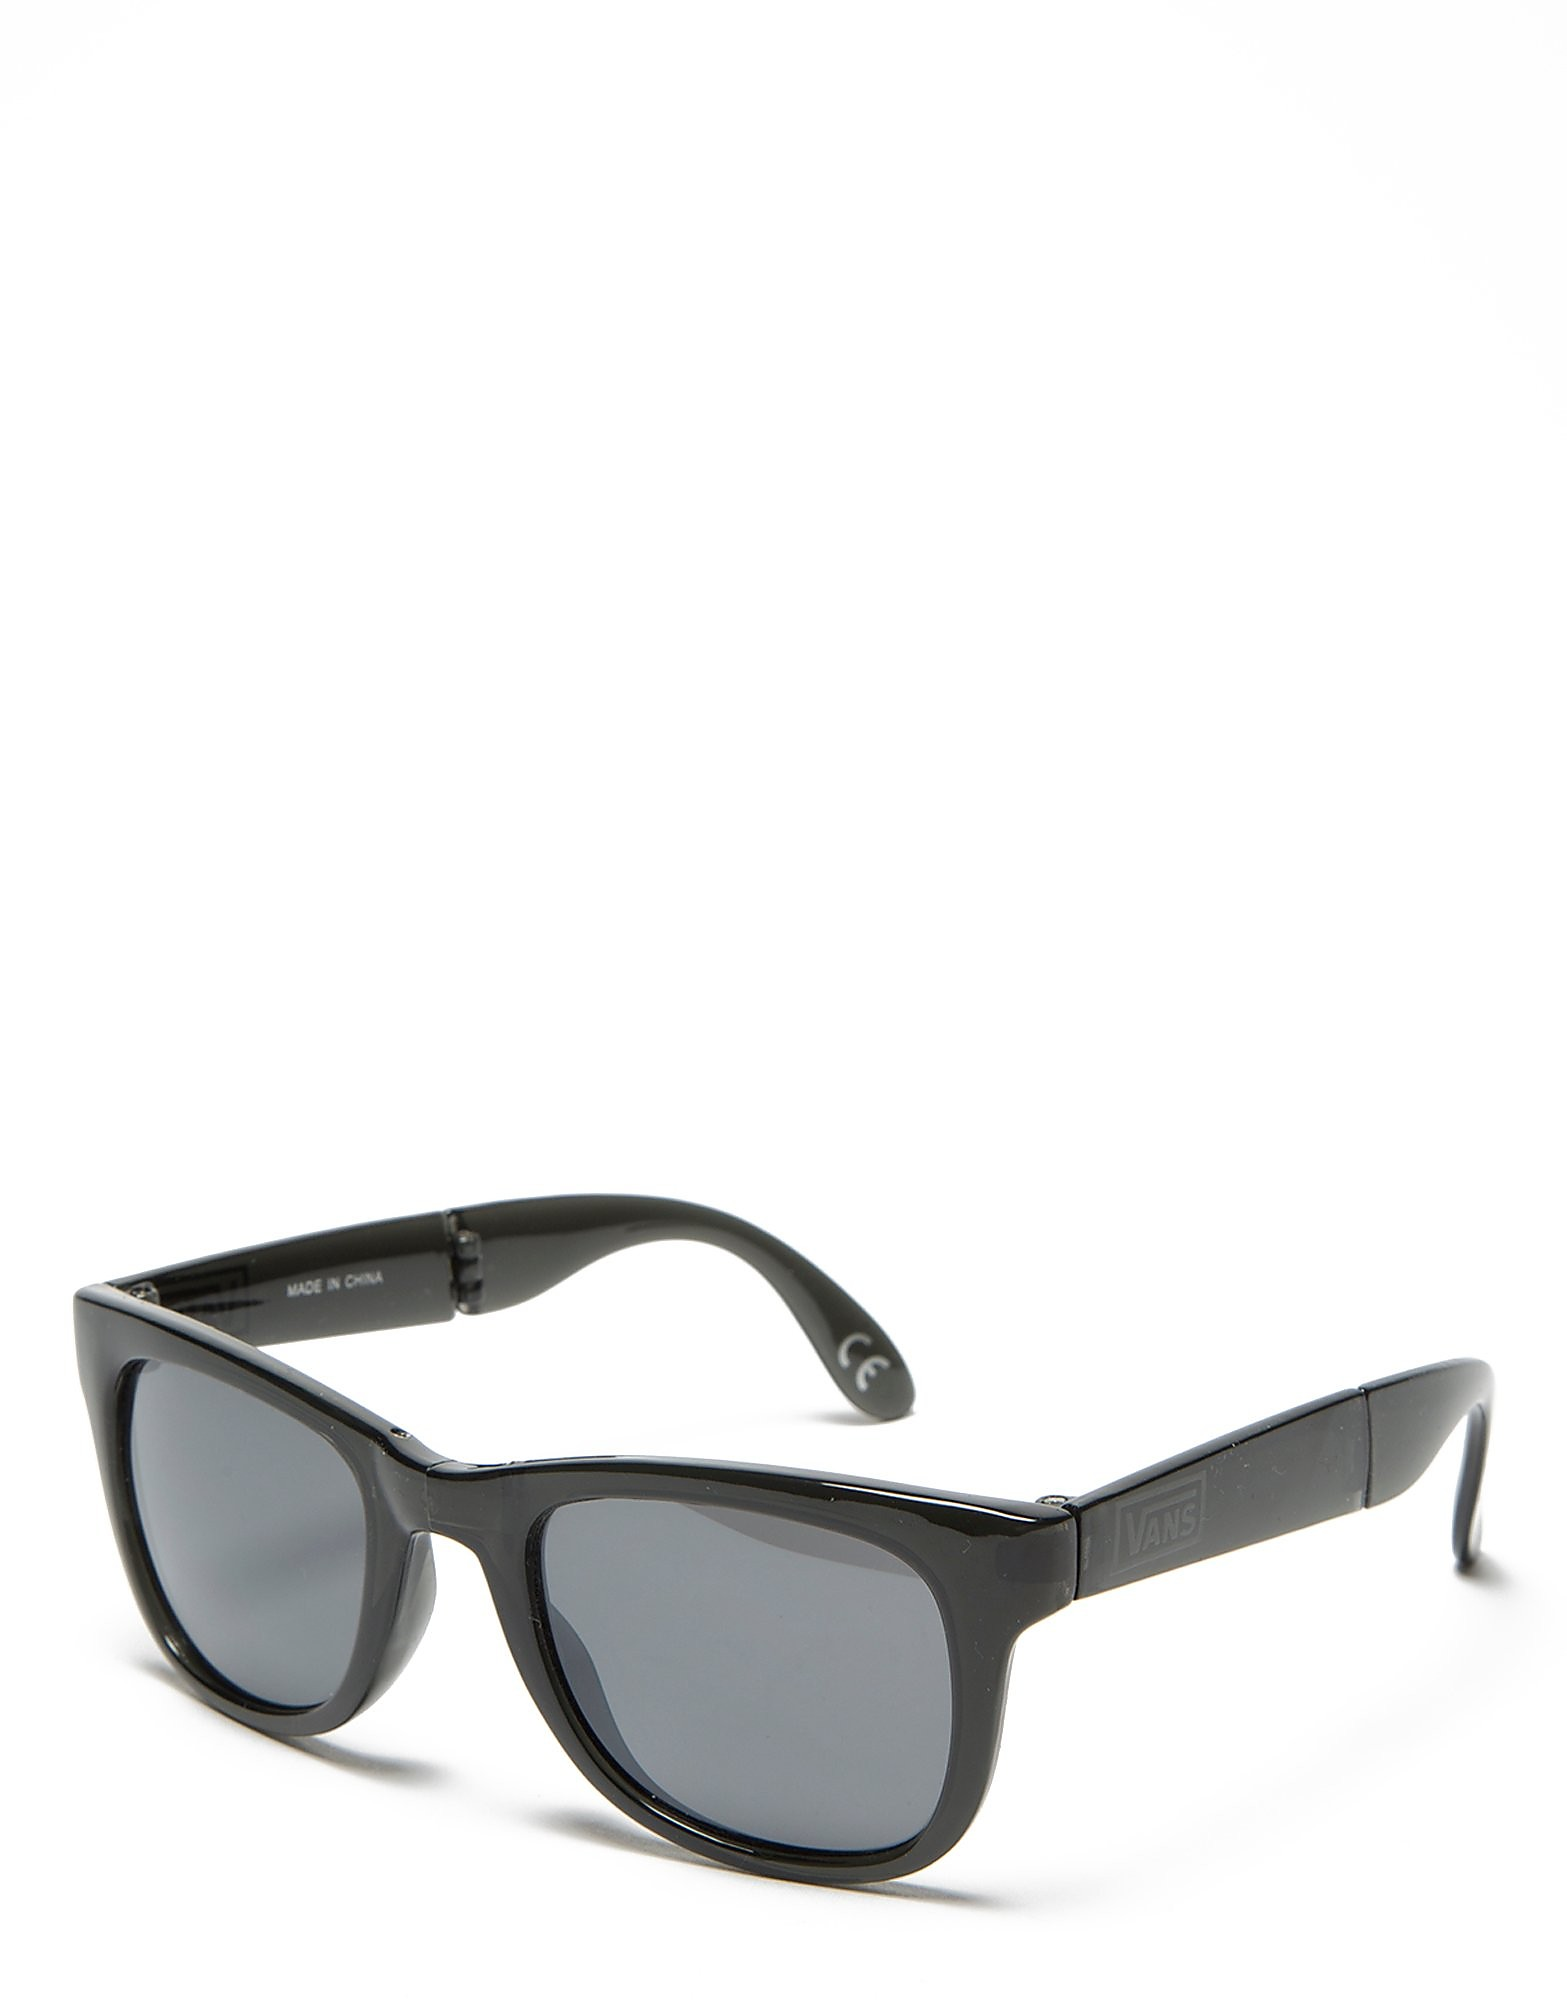 Vans Foldable Spicoli Sunglasses - Only at JD - Black - Mens, Black